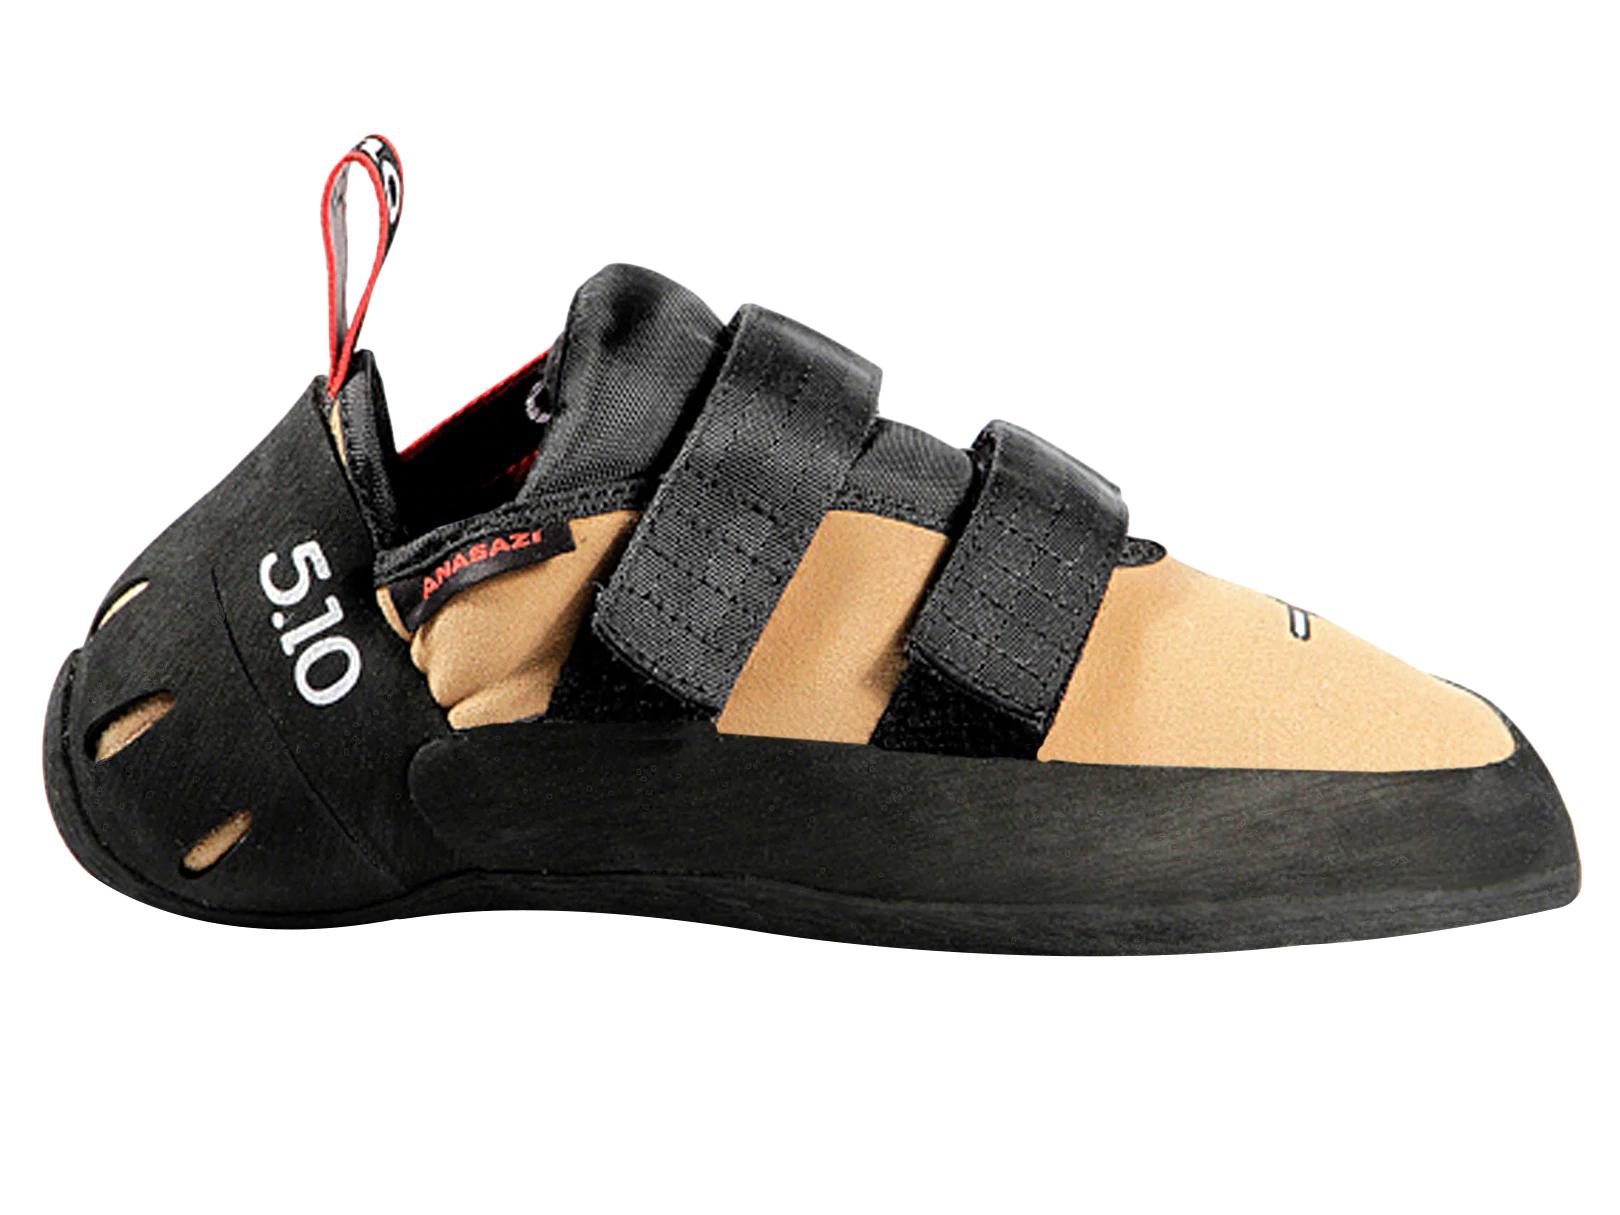 Liverpool en línea: Adidas Five-Ten Pies de gato-Zapatos de escalada Arrowhead